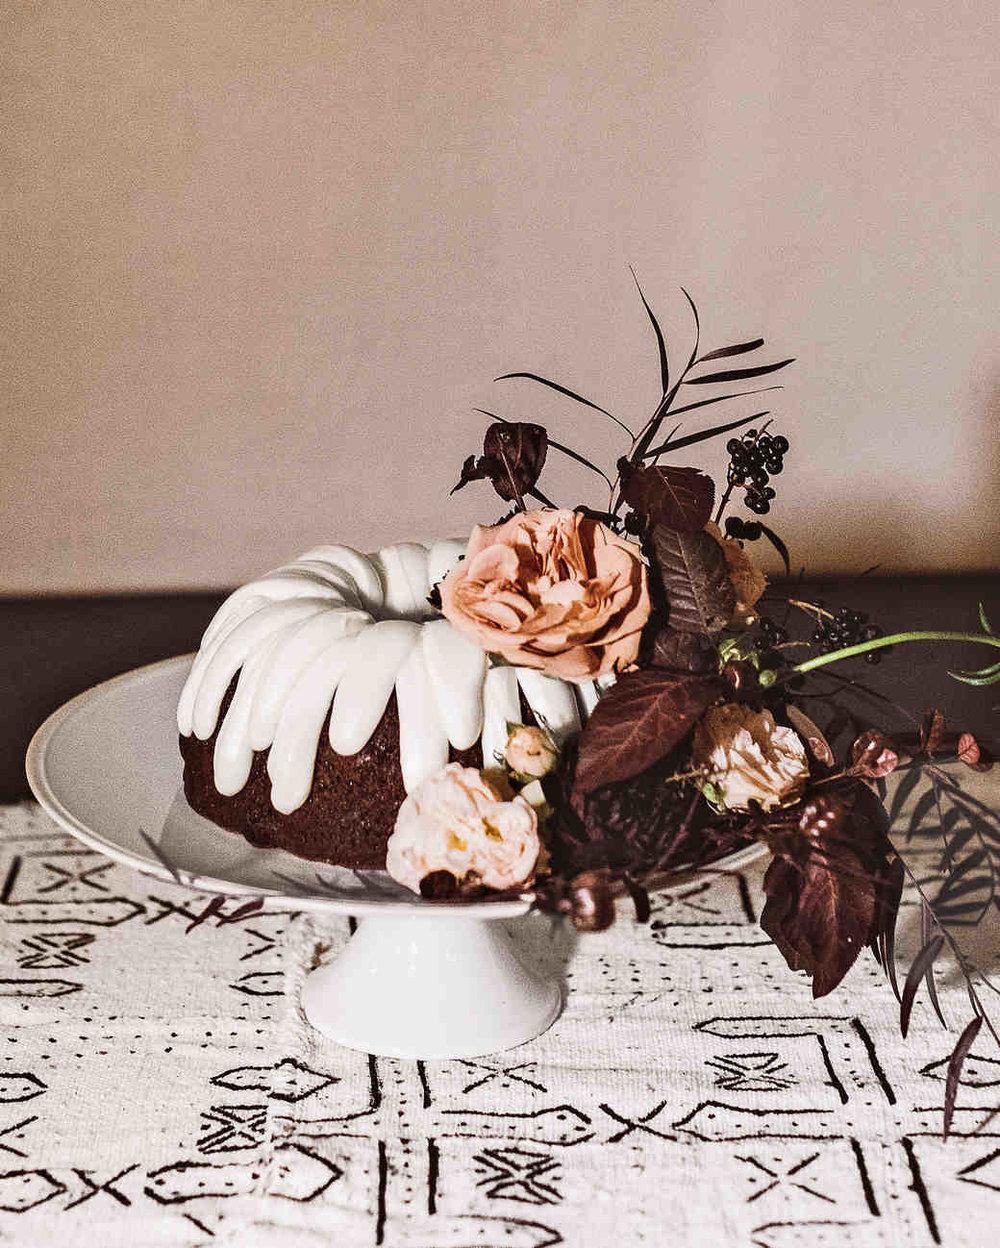 lori-john-wedding-california-cake-103037964_vert.jpg